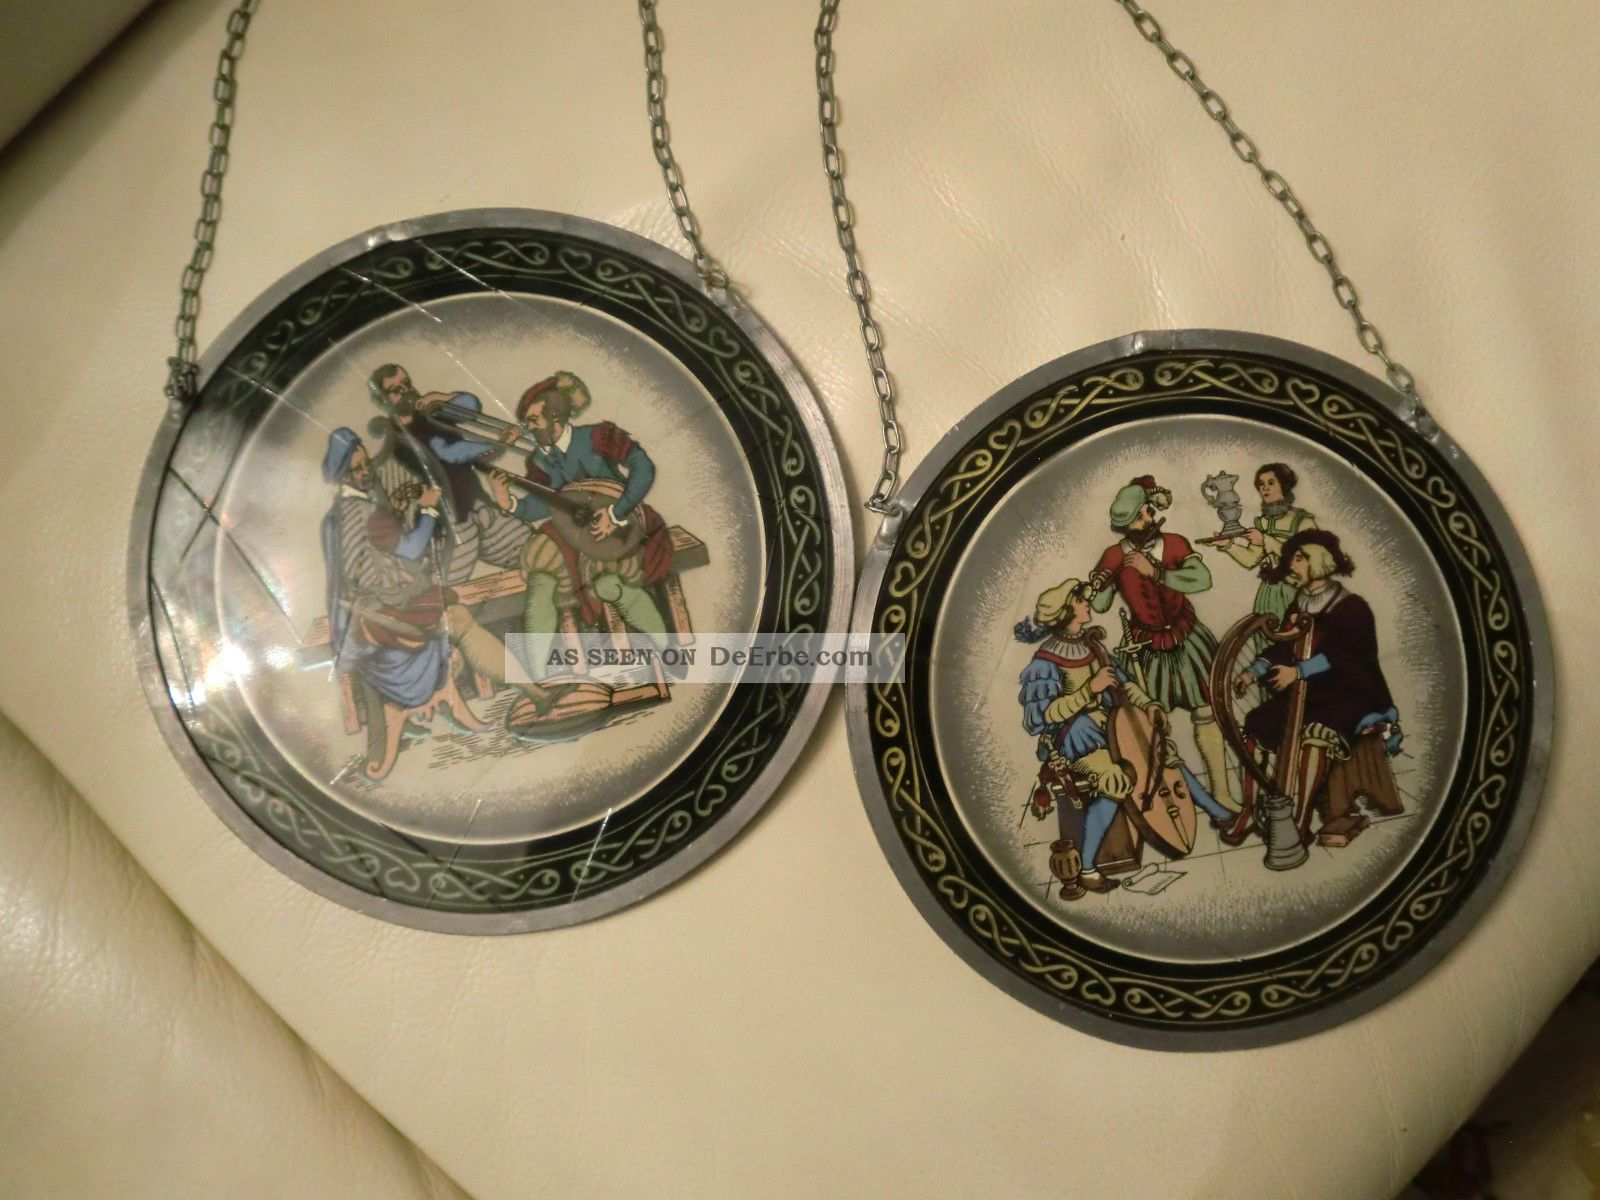 2 Fensterbilder,  Glasmalerei,  Hinterglasmalerei,  Bleiverglasung,  Glasbild,  Minnesang Glas & Kristall Bild